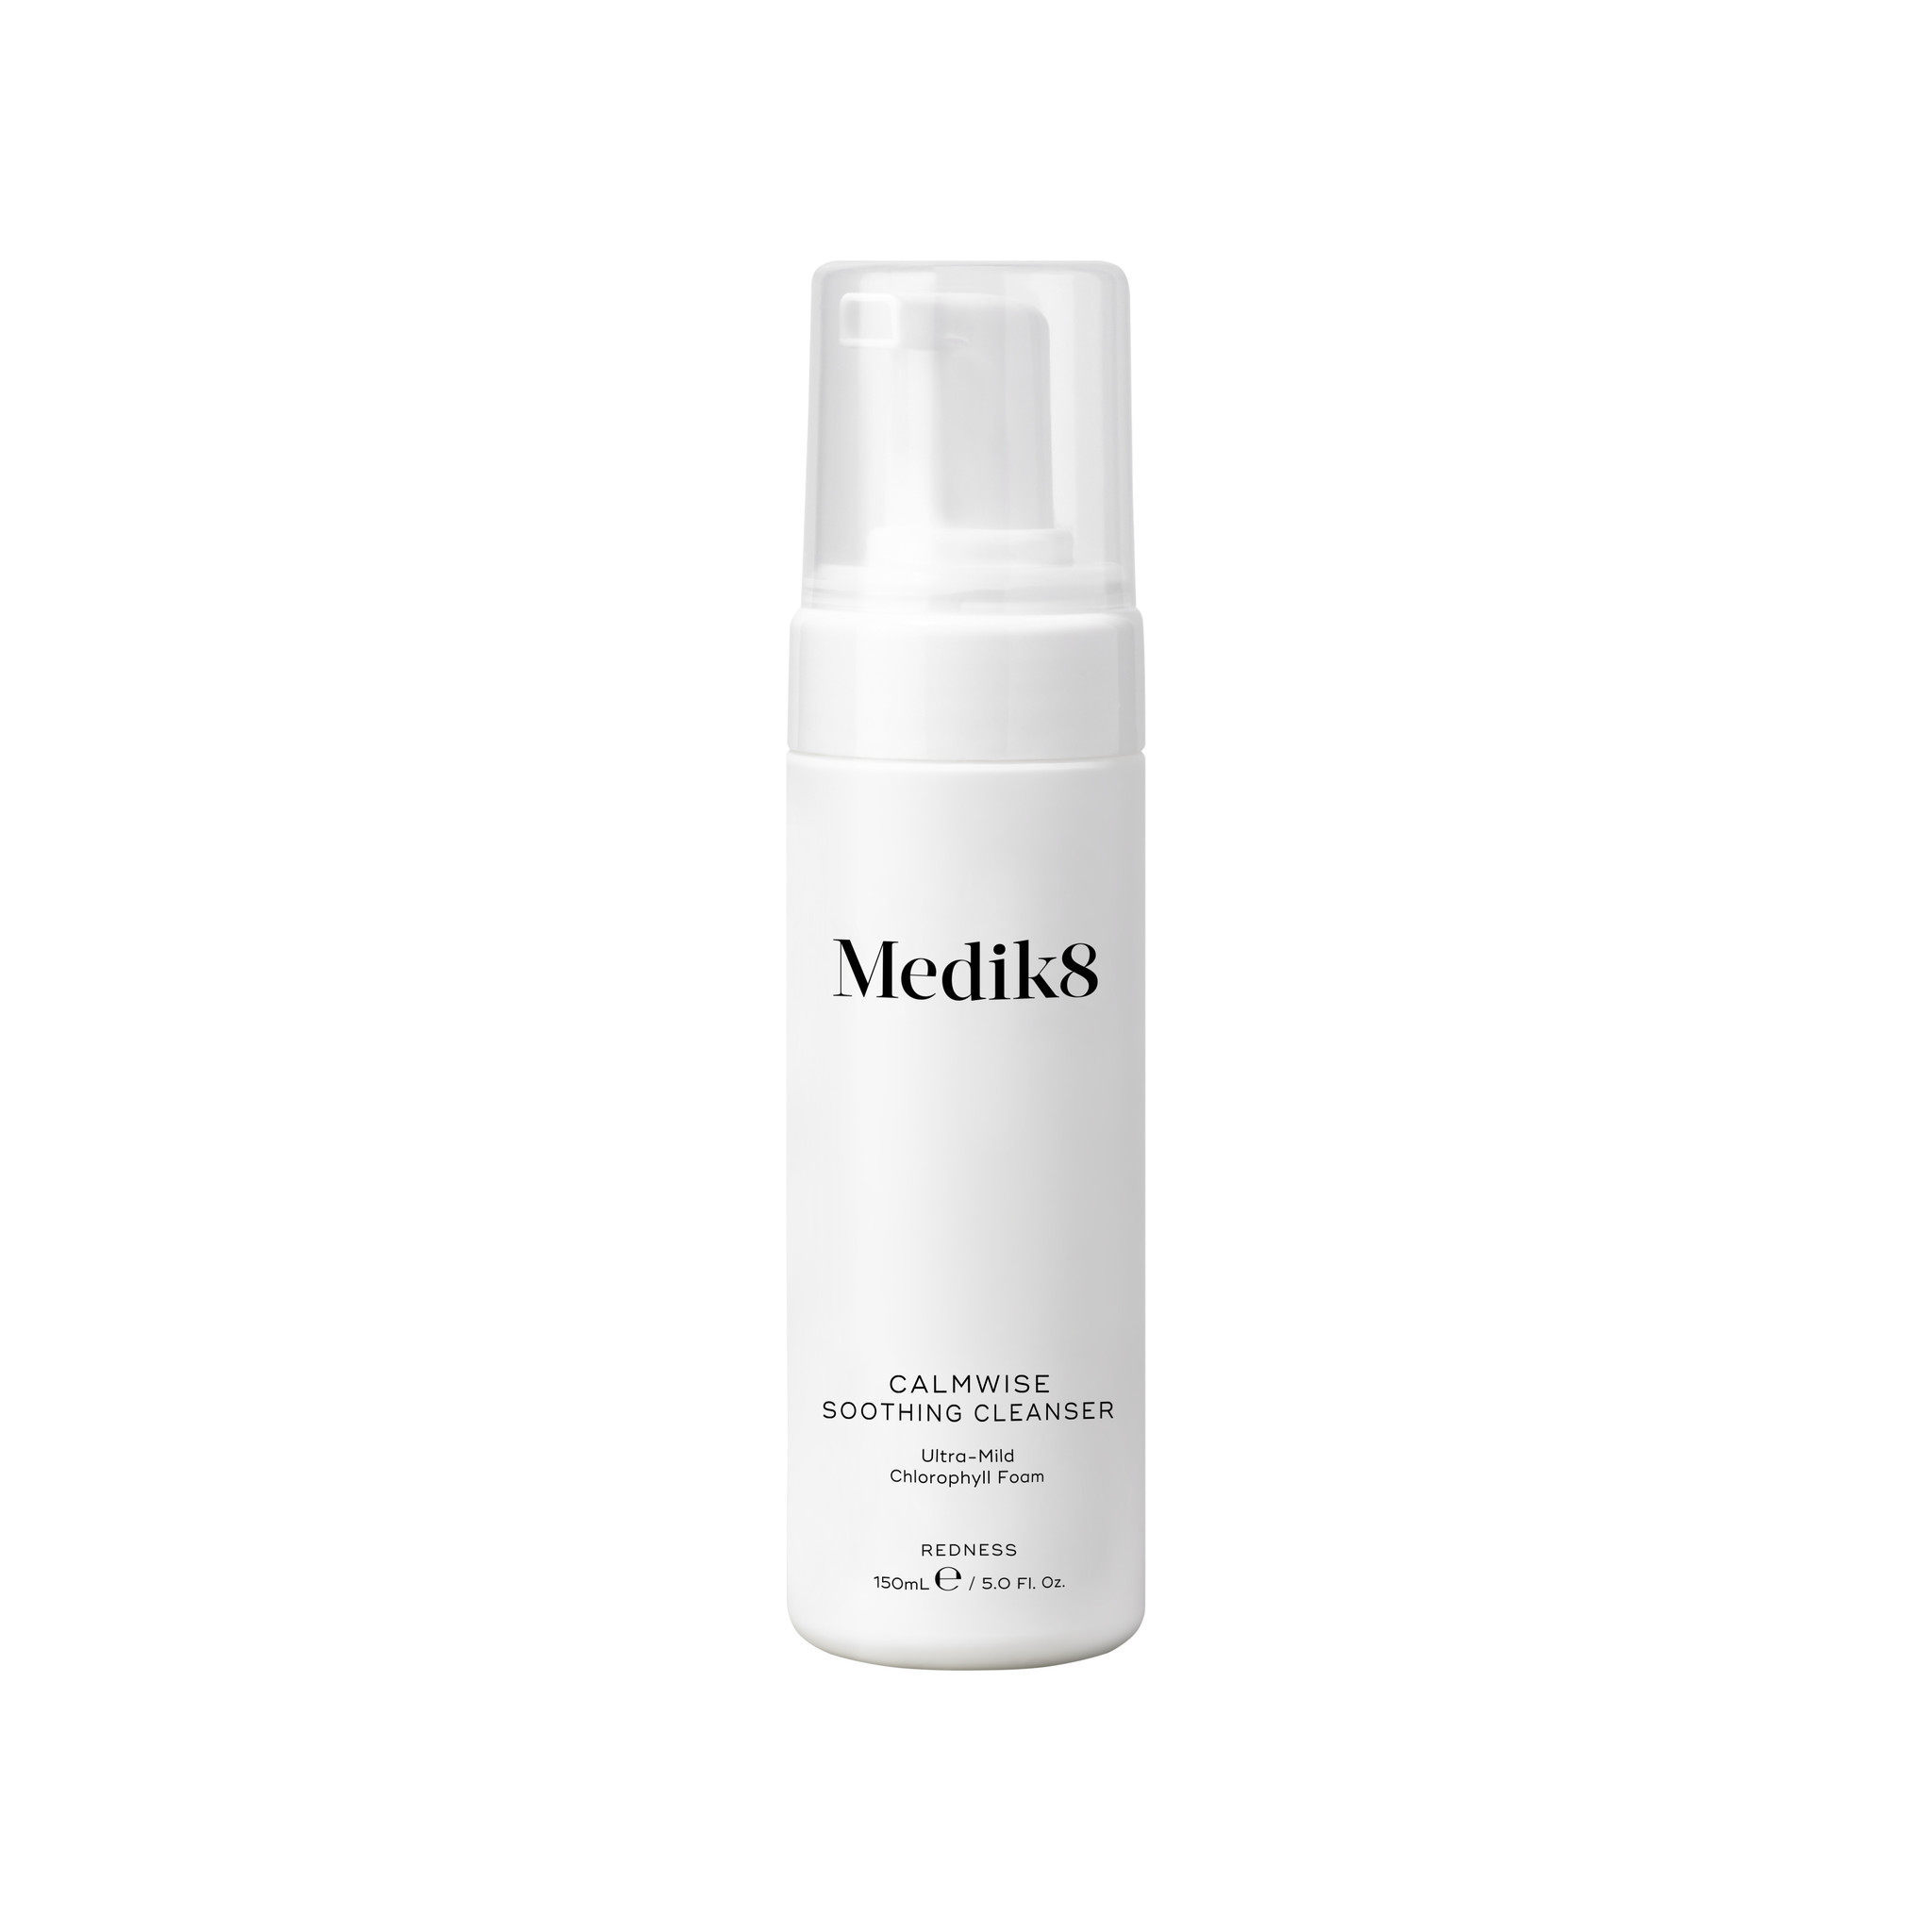 Medik8 Calmwise Colour Correct | Ultra-Mild Chlorophyll Foam | 150ml